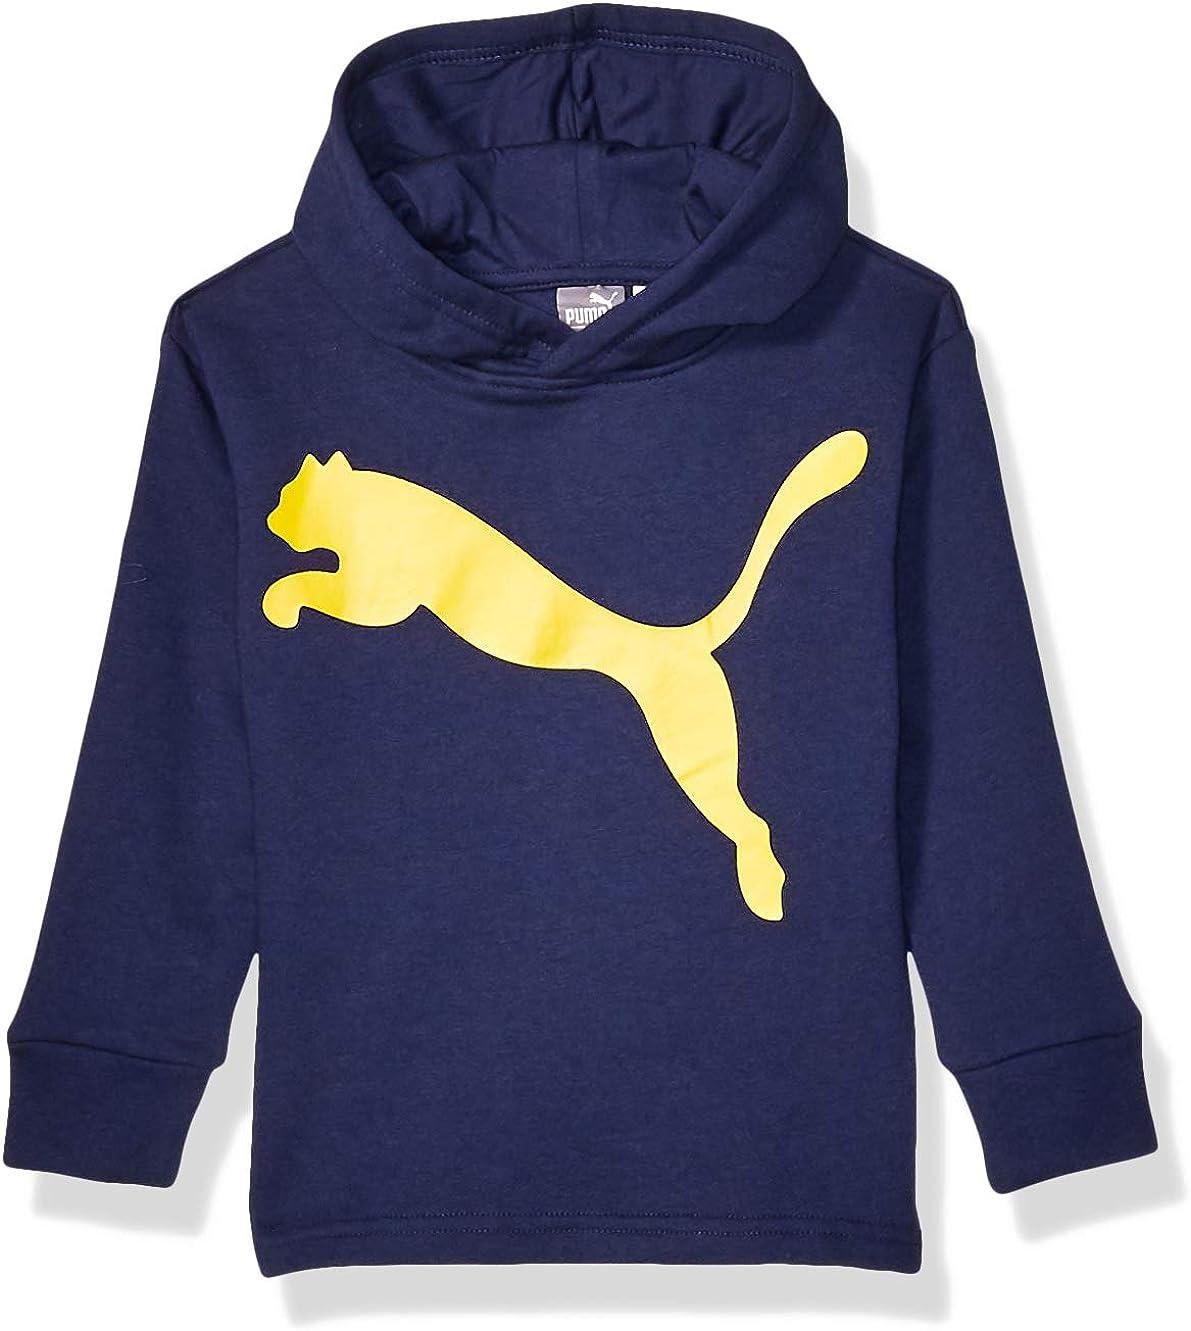 PUMA Boys' Big Cat Fleece Hoodie